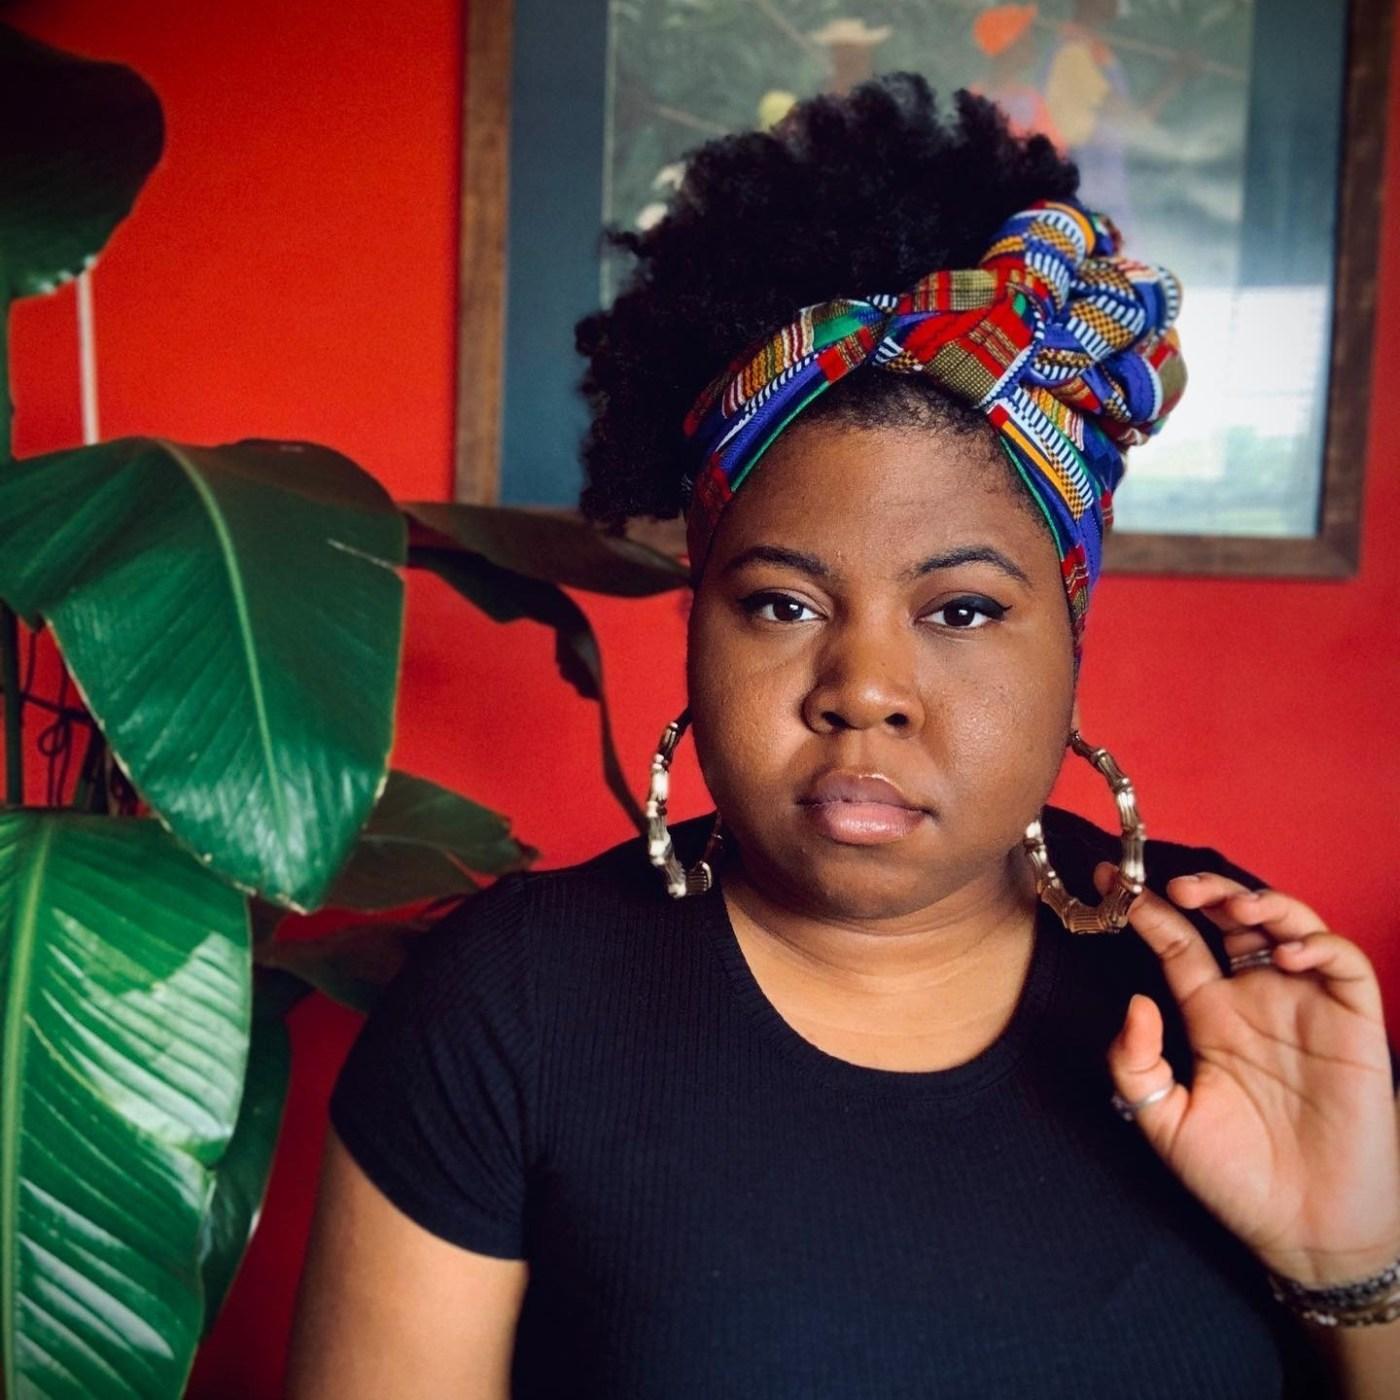 Ashley jones, first black poet laureate of Alabama